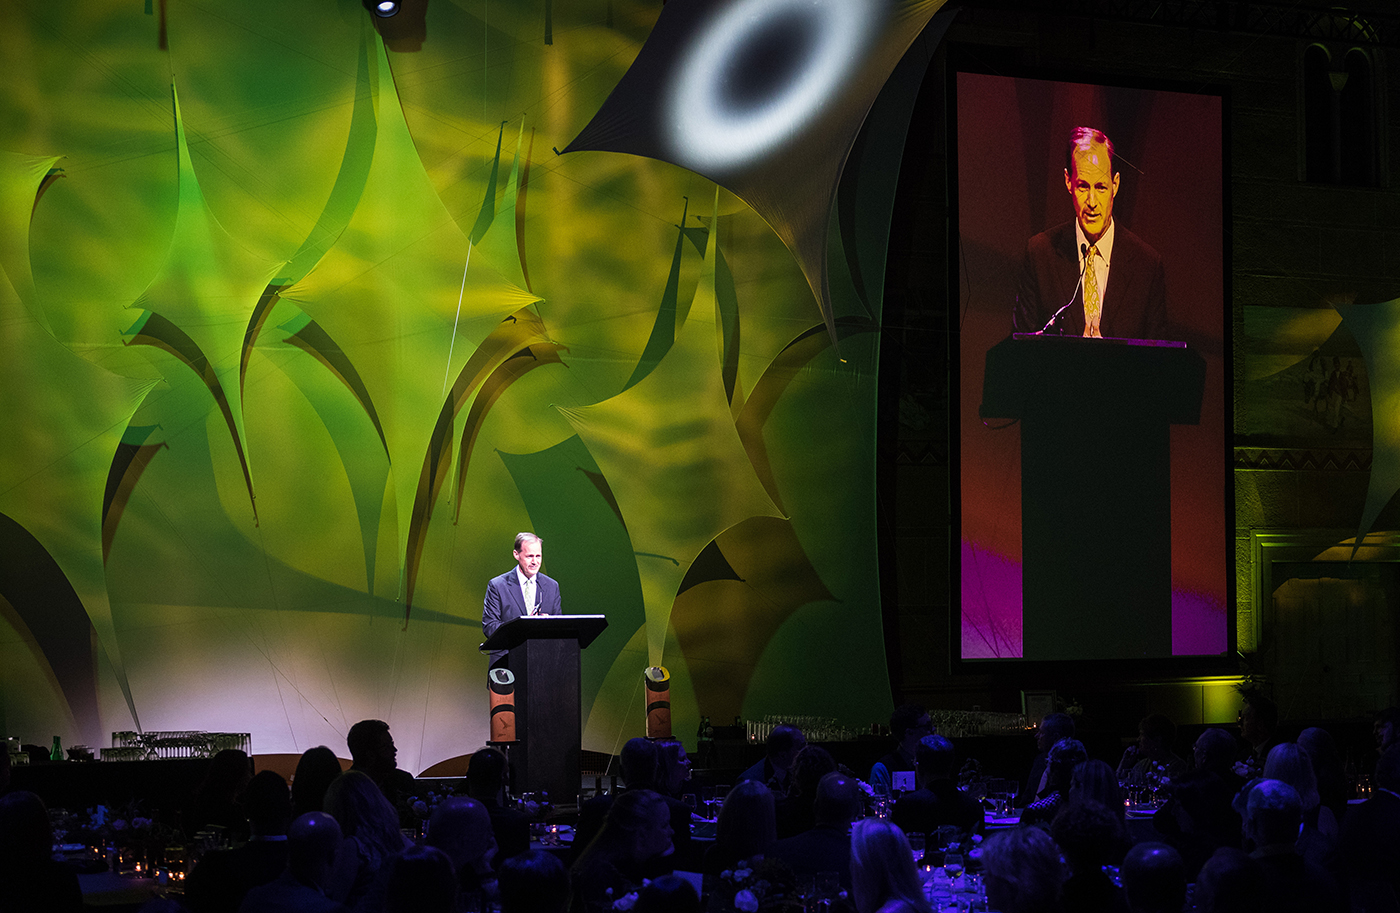 Pioneer awards flanking podium and speaker